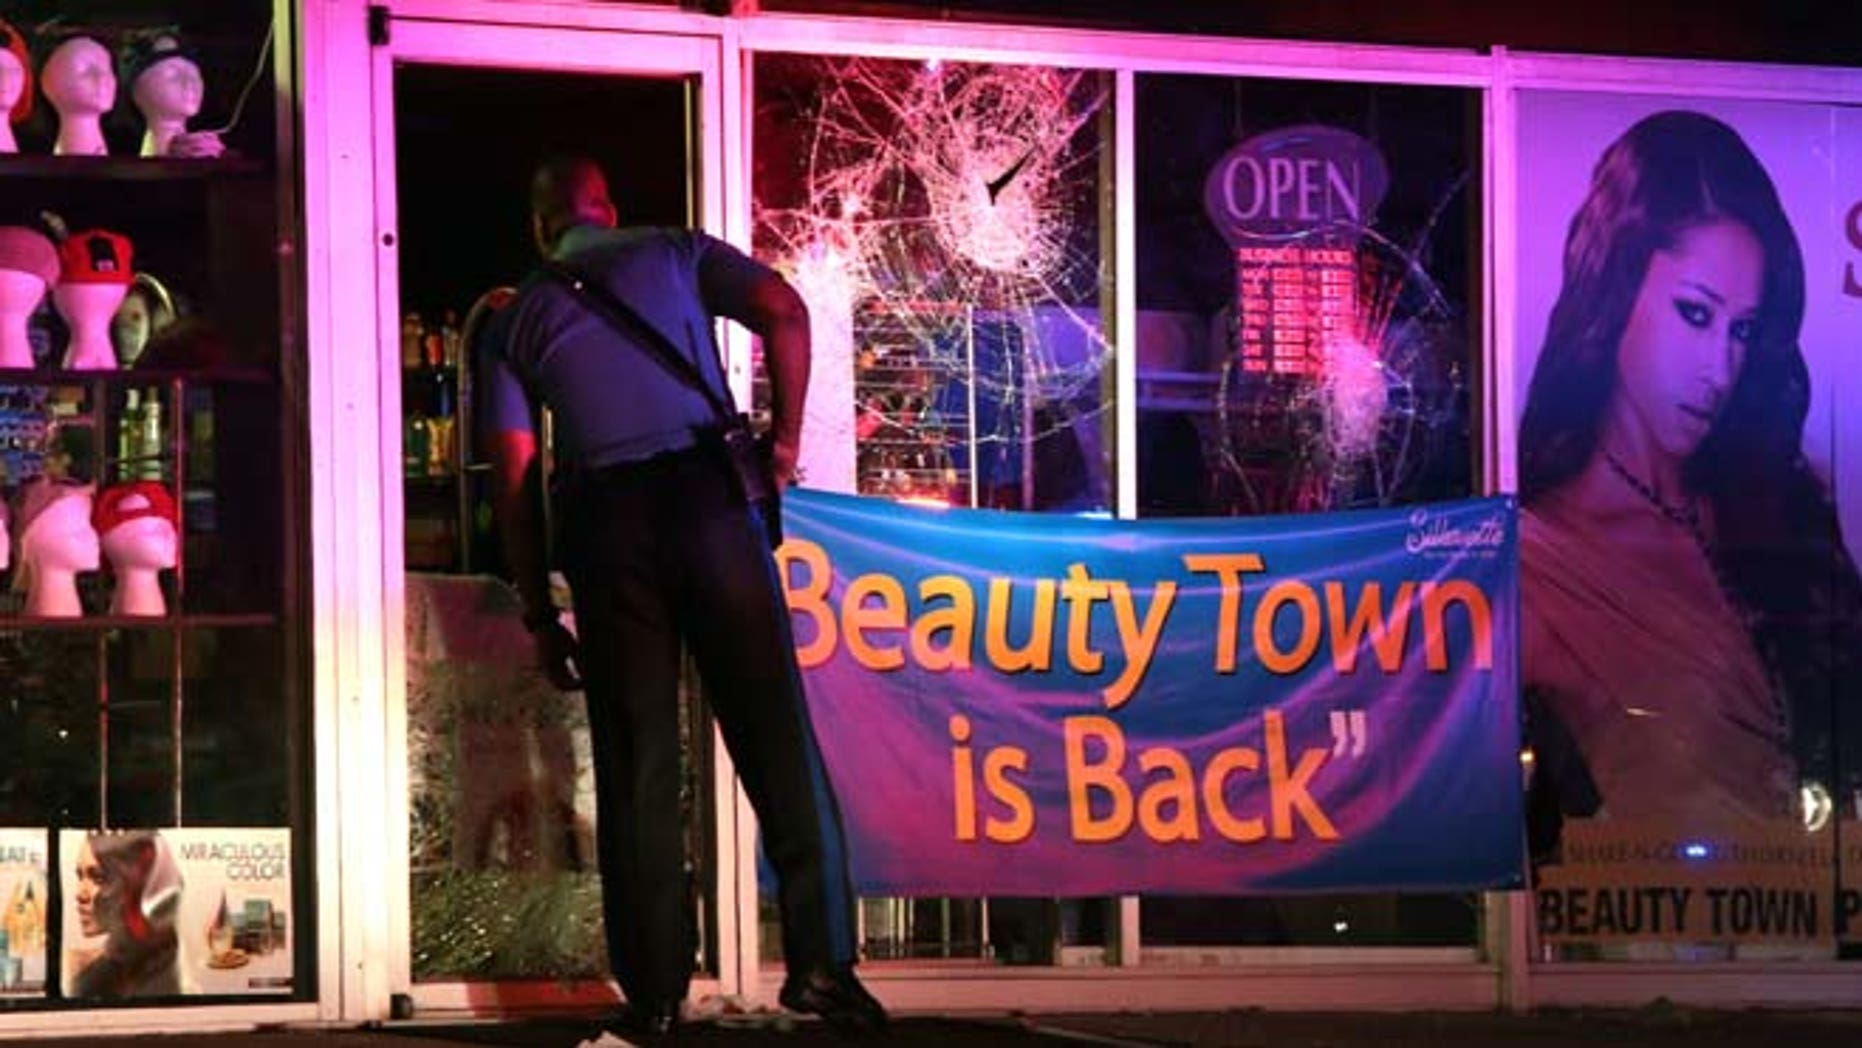 Sept. 23, 2014: A Missouri Highway Patrol trooper looks inside the vandalized Beauty Town store on West Florissant Avenue in Ferguson. (AP Photo/St. Louis Post-Dispatch)